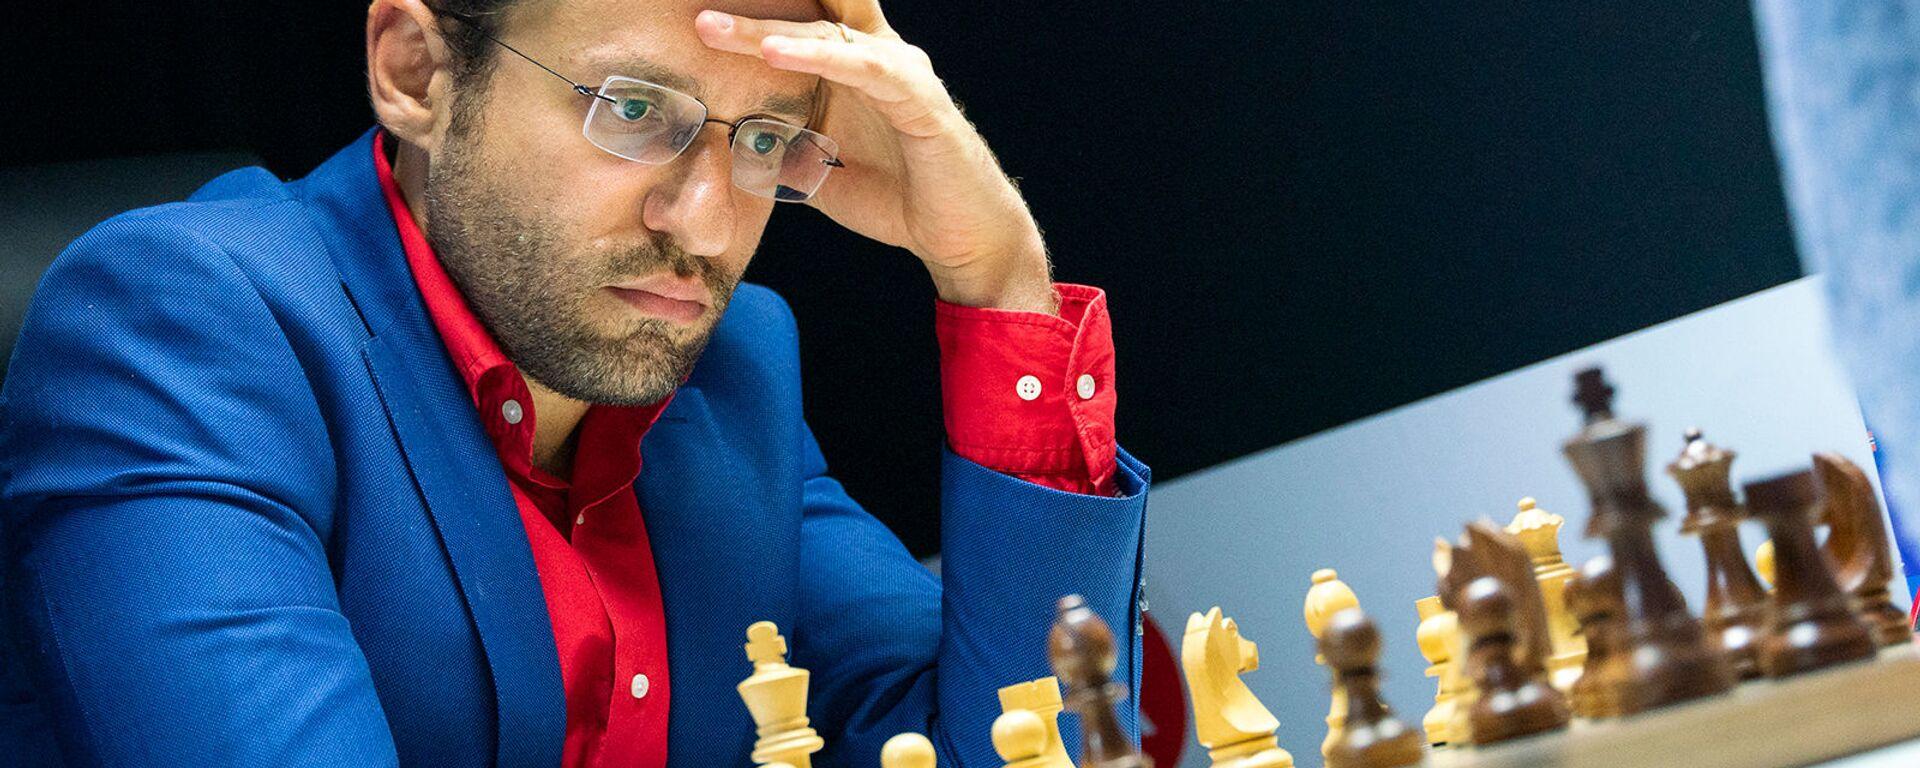 Гроссмейстер Левон Аронян во время блиц-турнира Altibox Norway Chess 2019 (3 июня 2019). Ставангер, Норвегия - Sputnik Армения, 1920, 27.09.2021